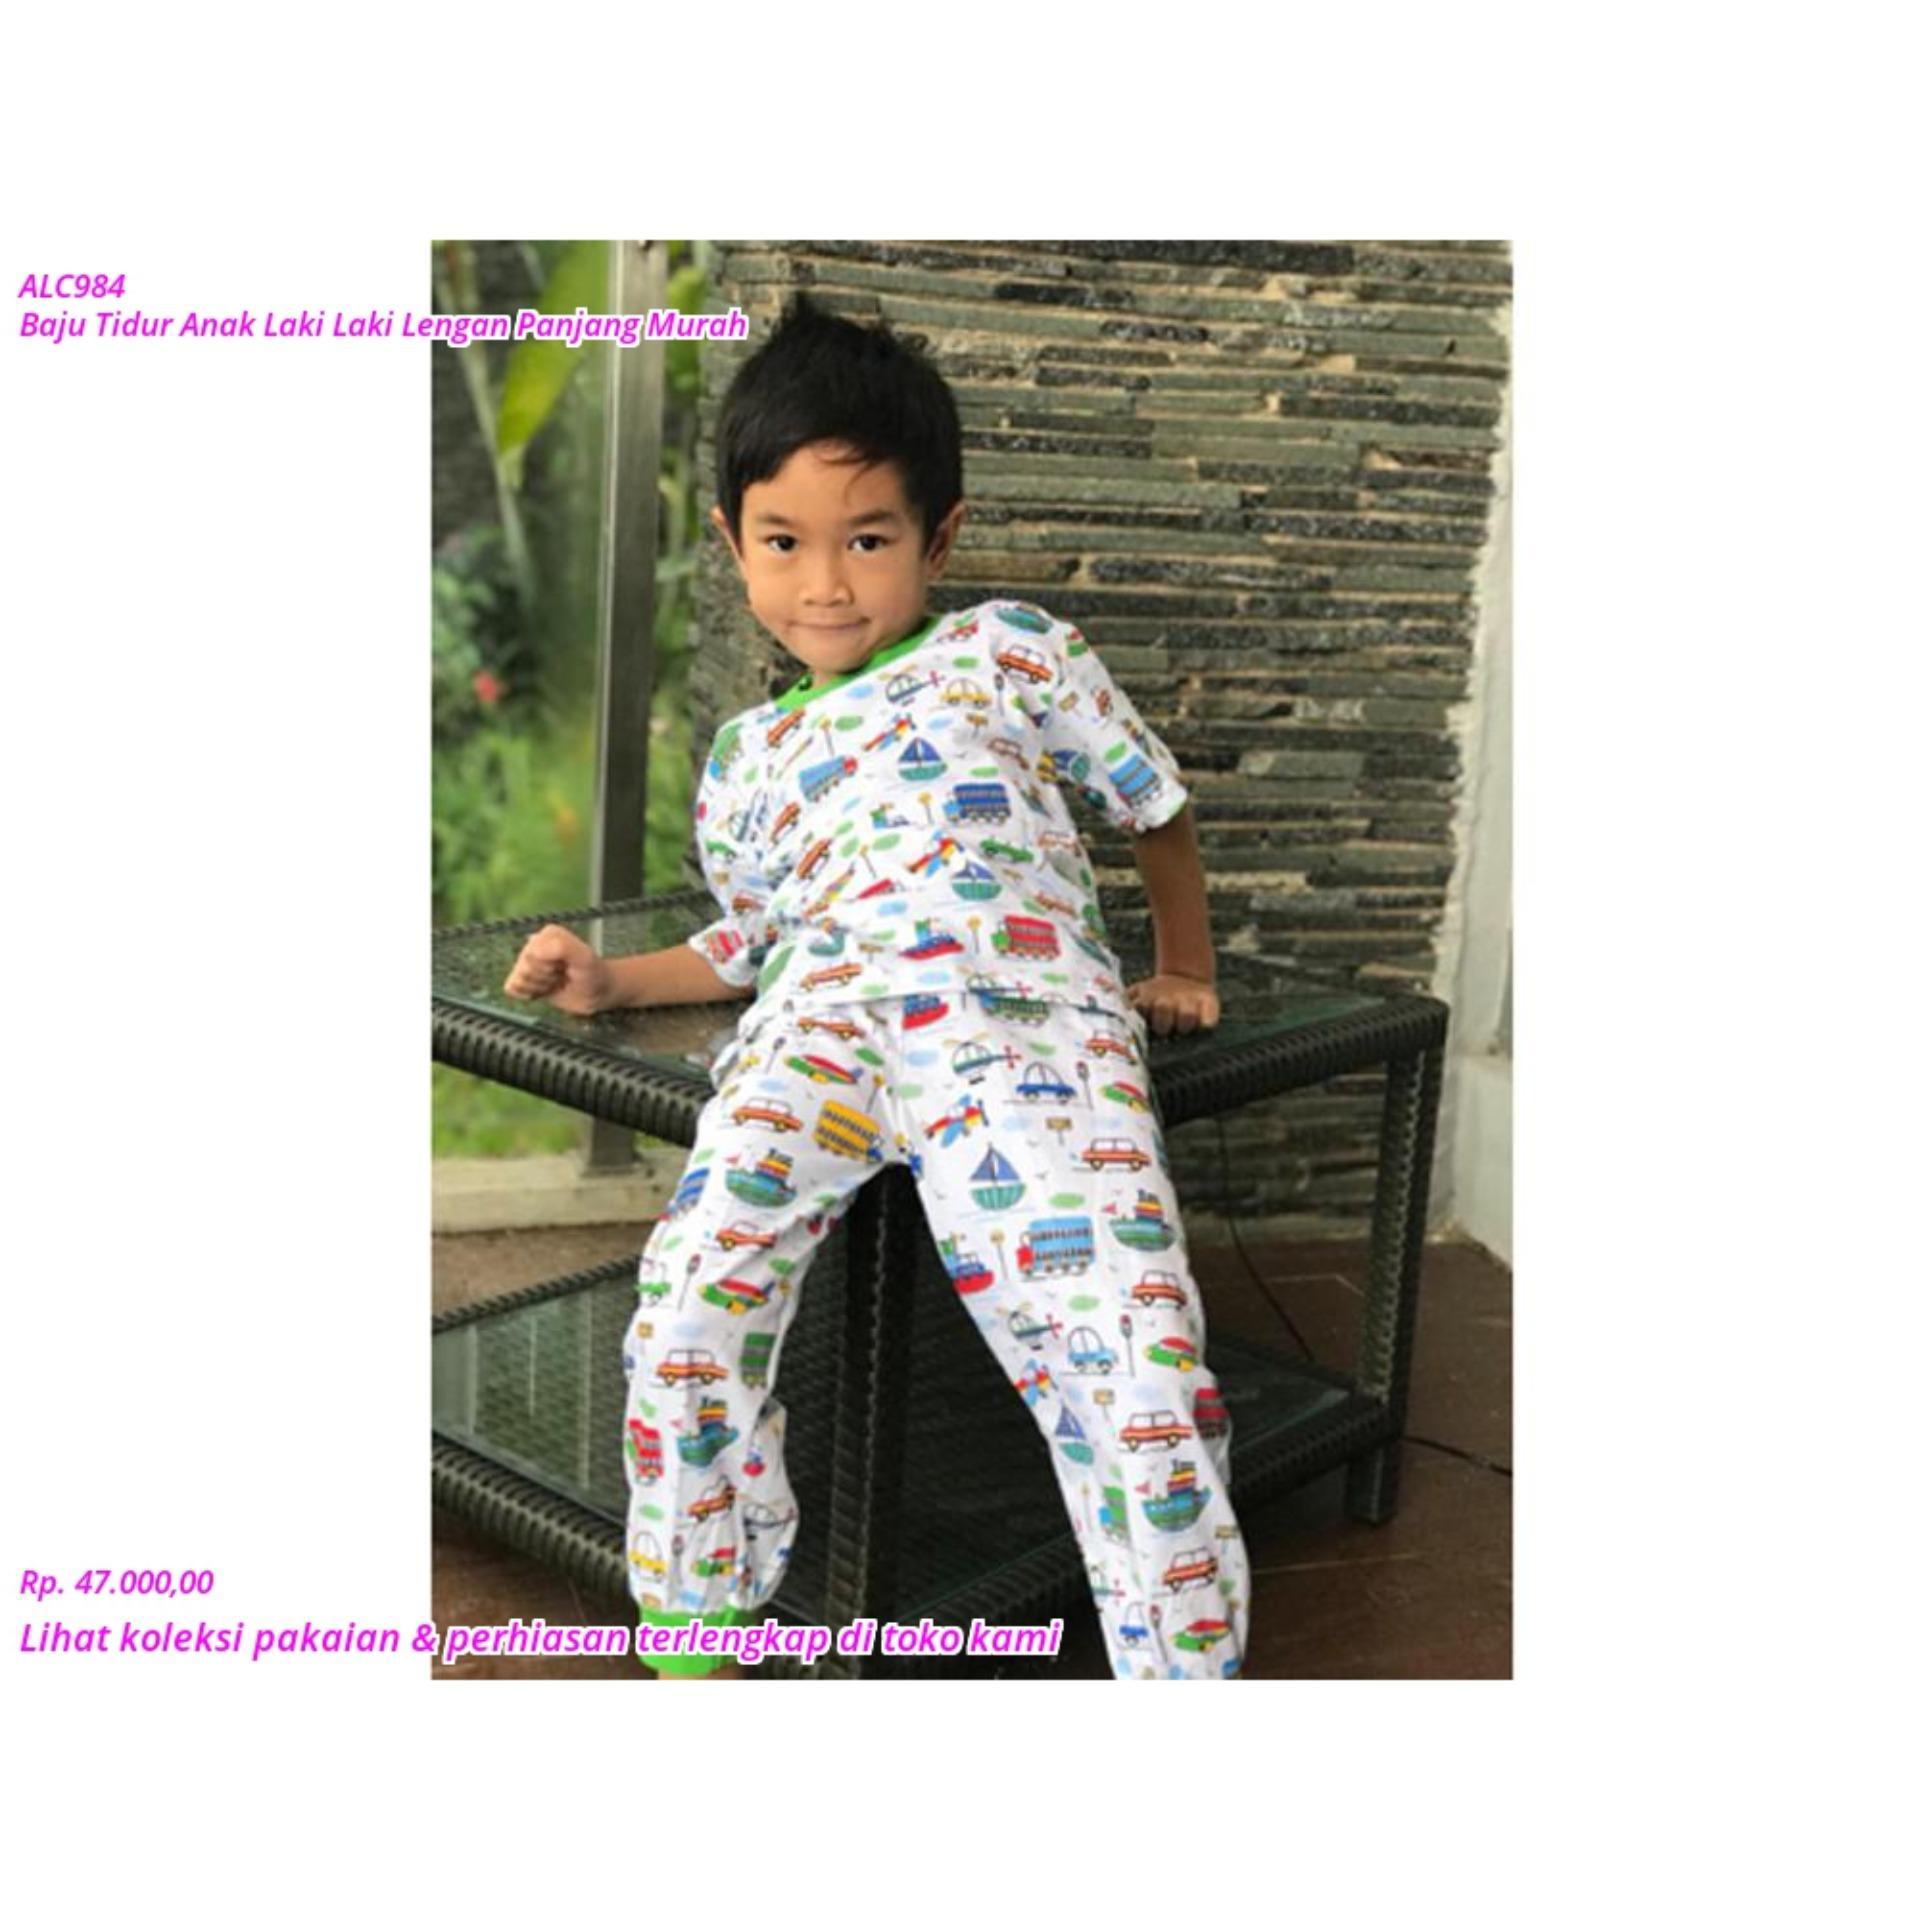 SALE Baju Tidur Anak Laki Laki Lengan Panjang Murah TERMURAH